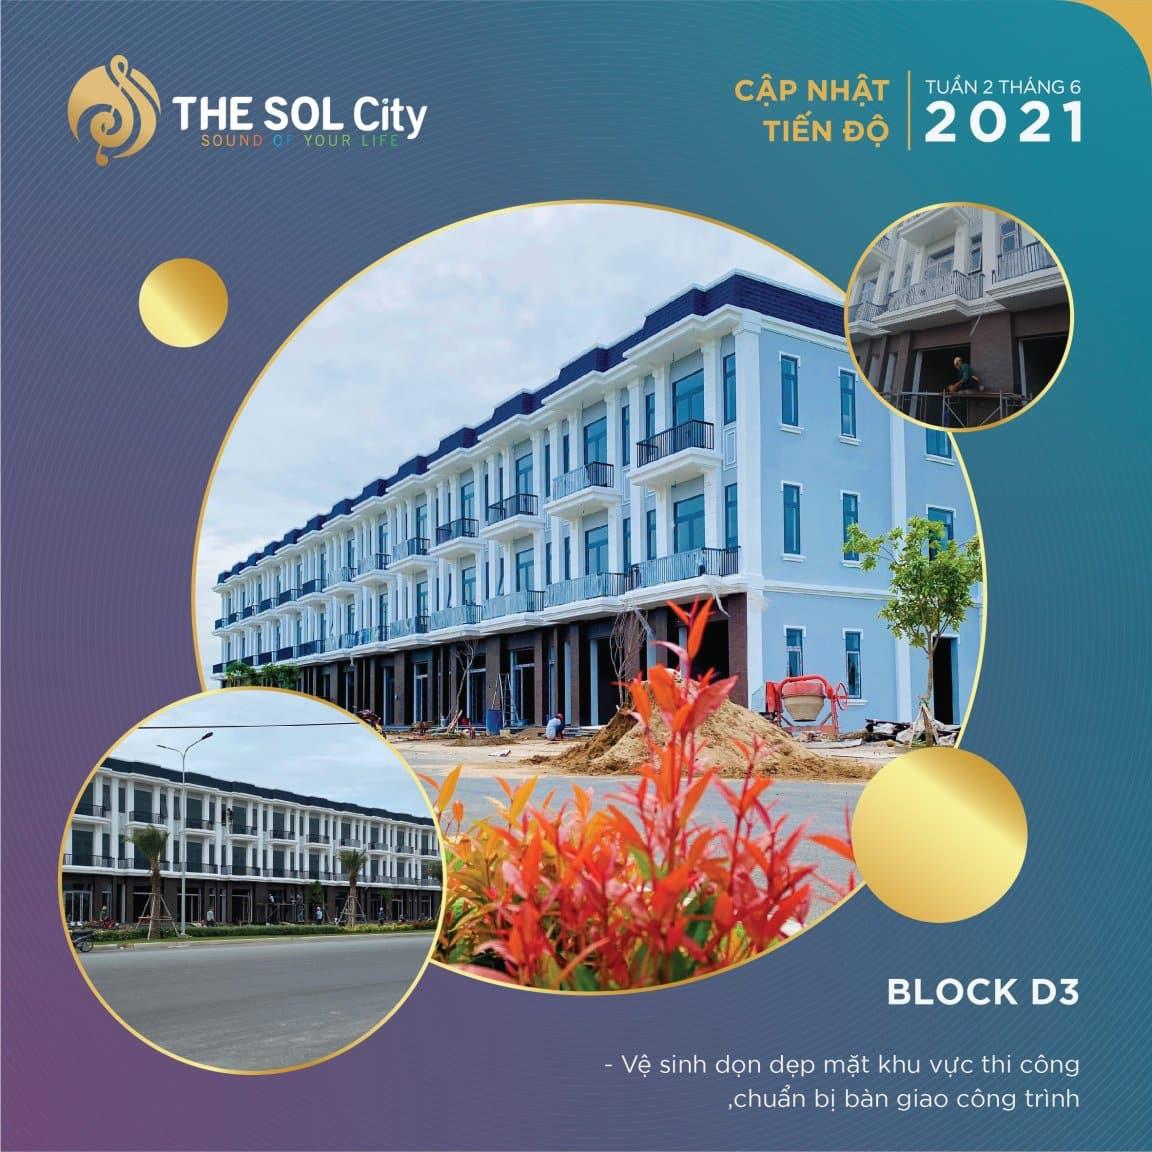 THE SOL CITY